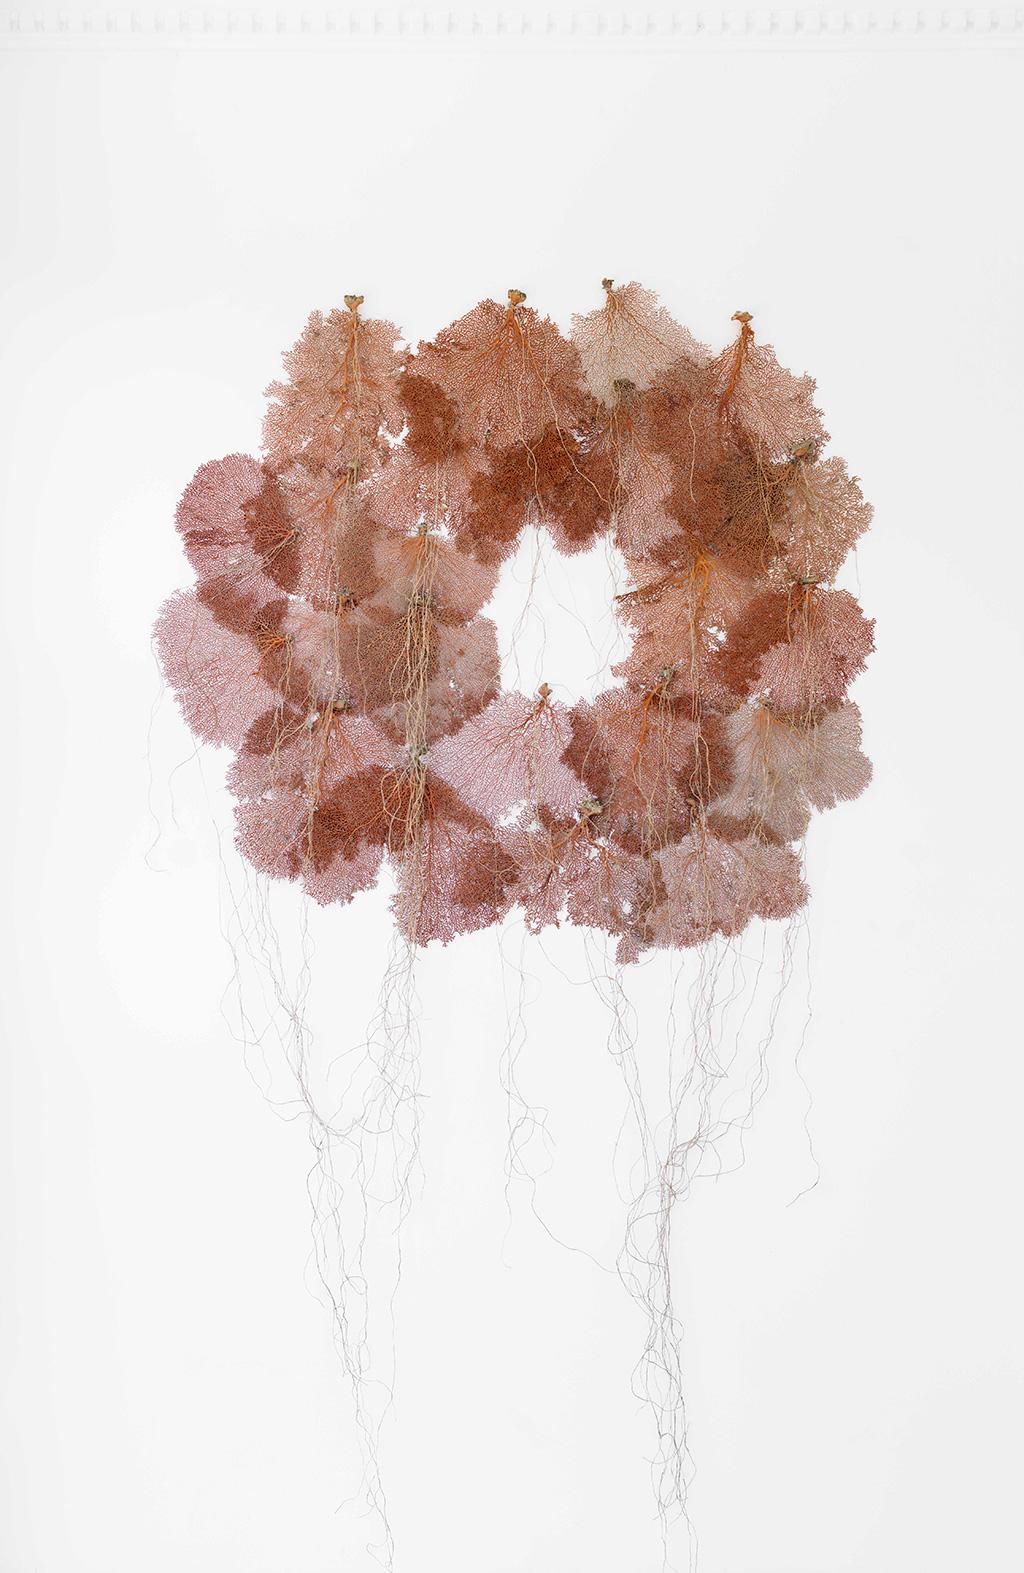 Coral-Reef,-coral,-hemp,-216x120x5cm,-$8800